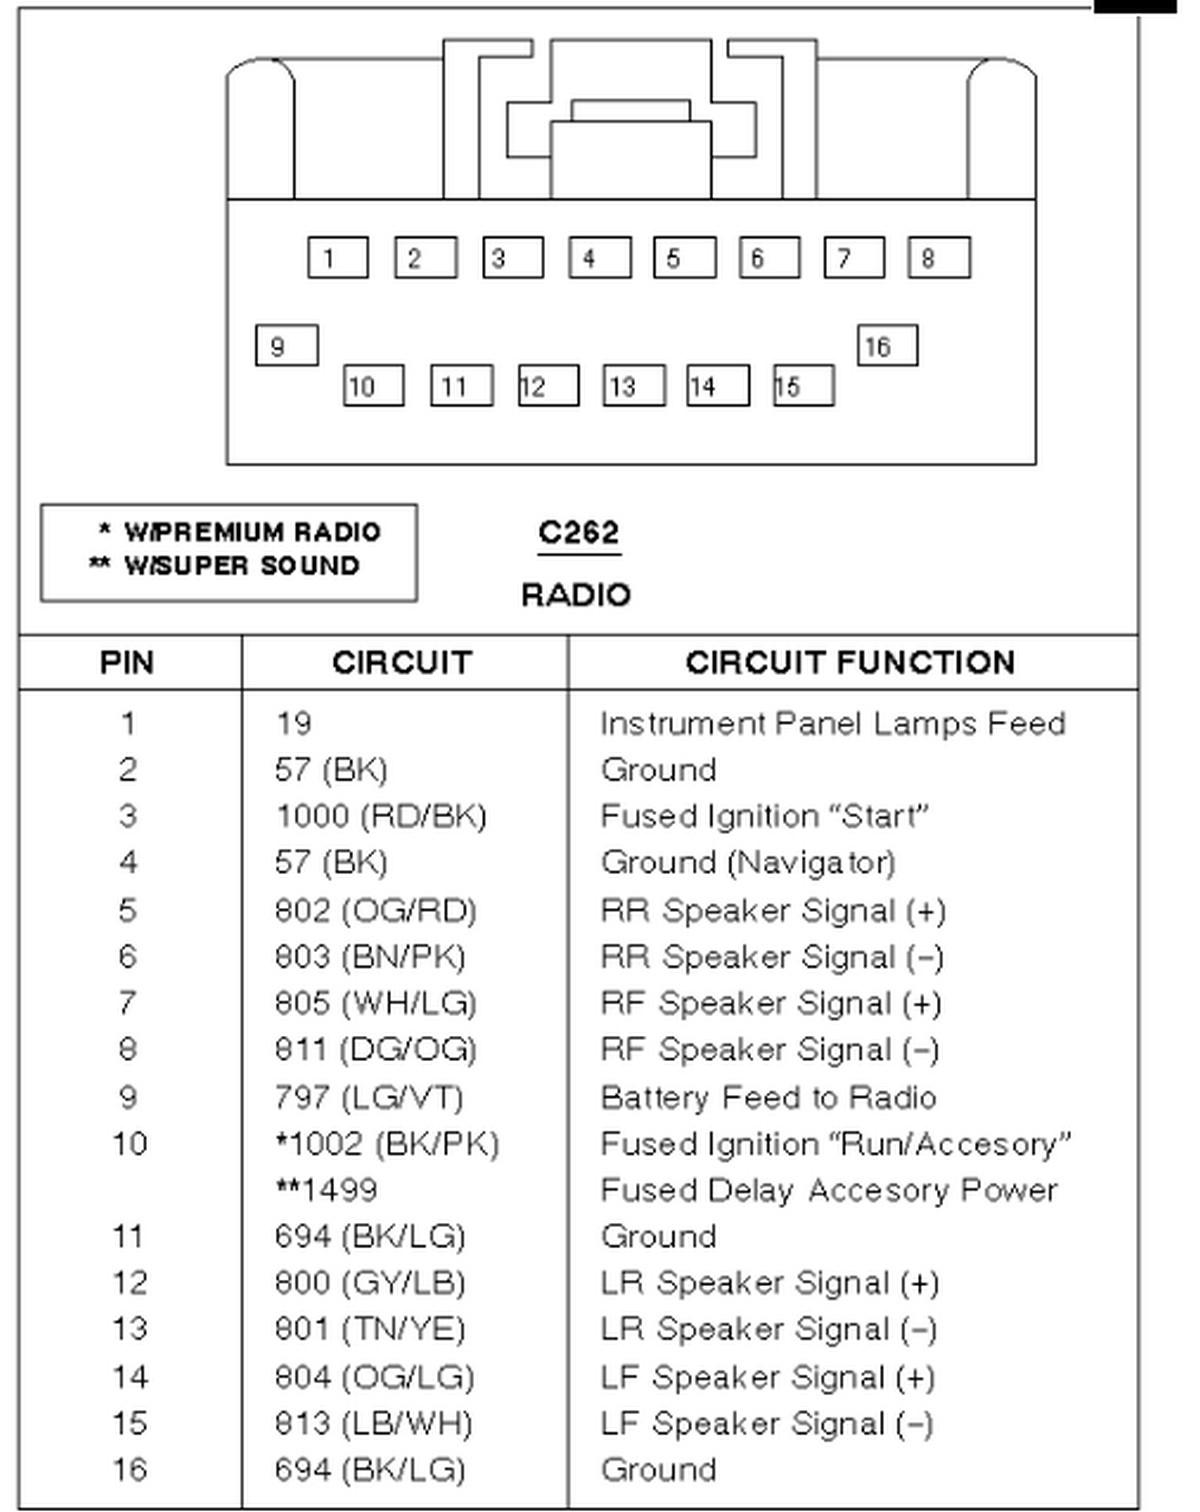 2014 Ford Escape Radio Wiring Diagram Wiring Diagram Resource B Resource B Led Illumina It